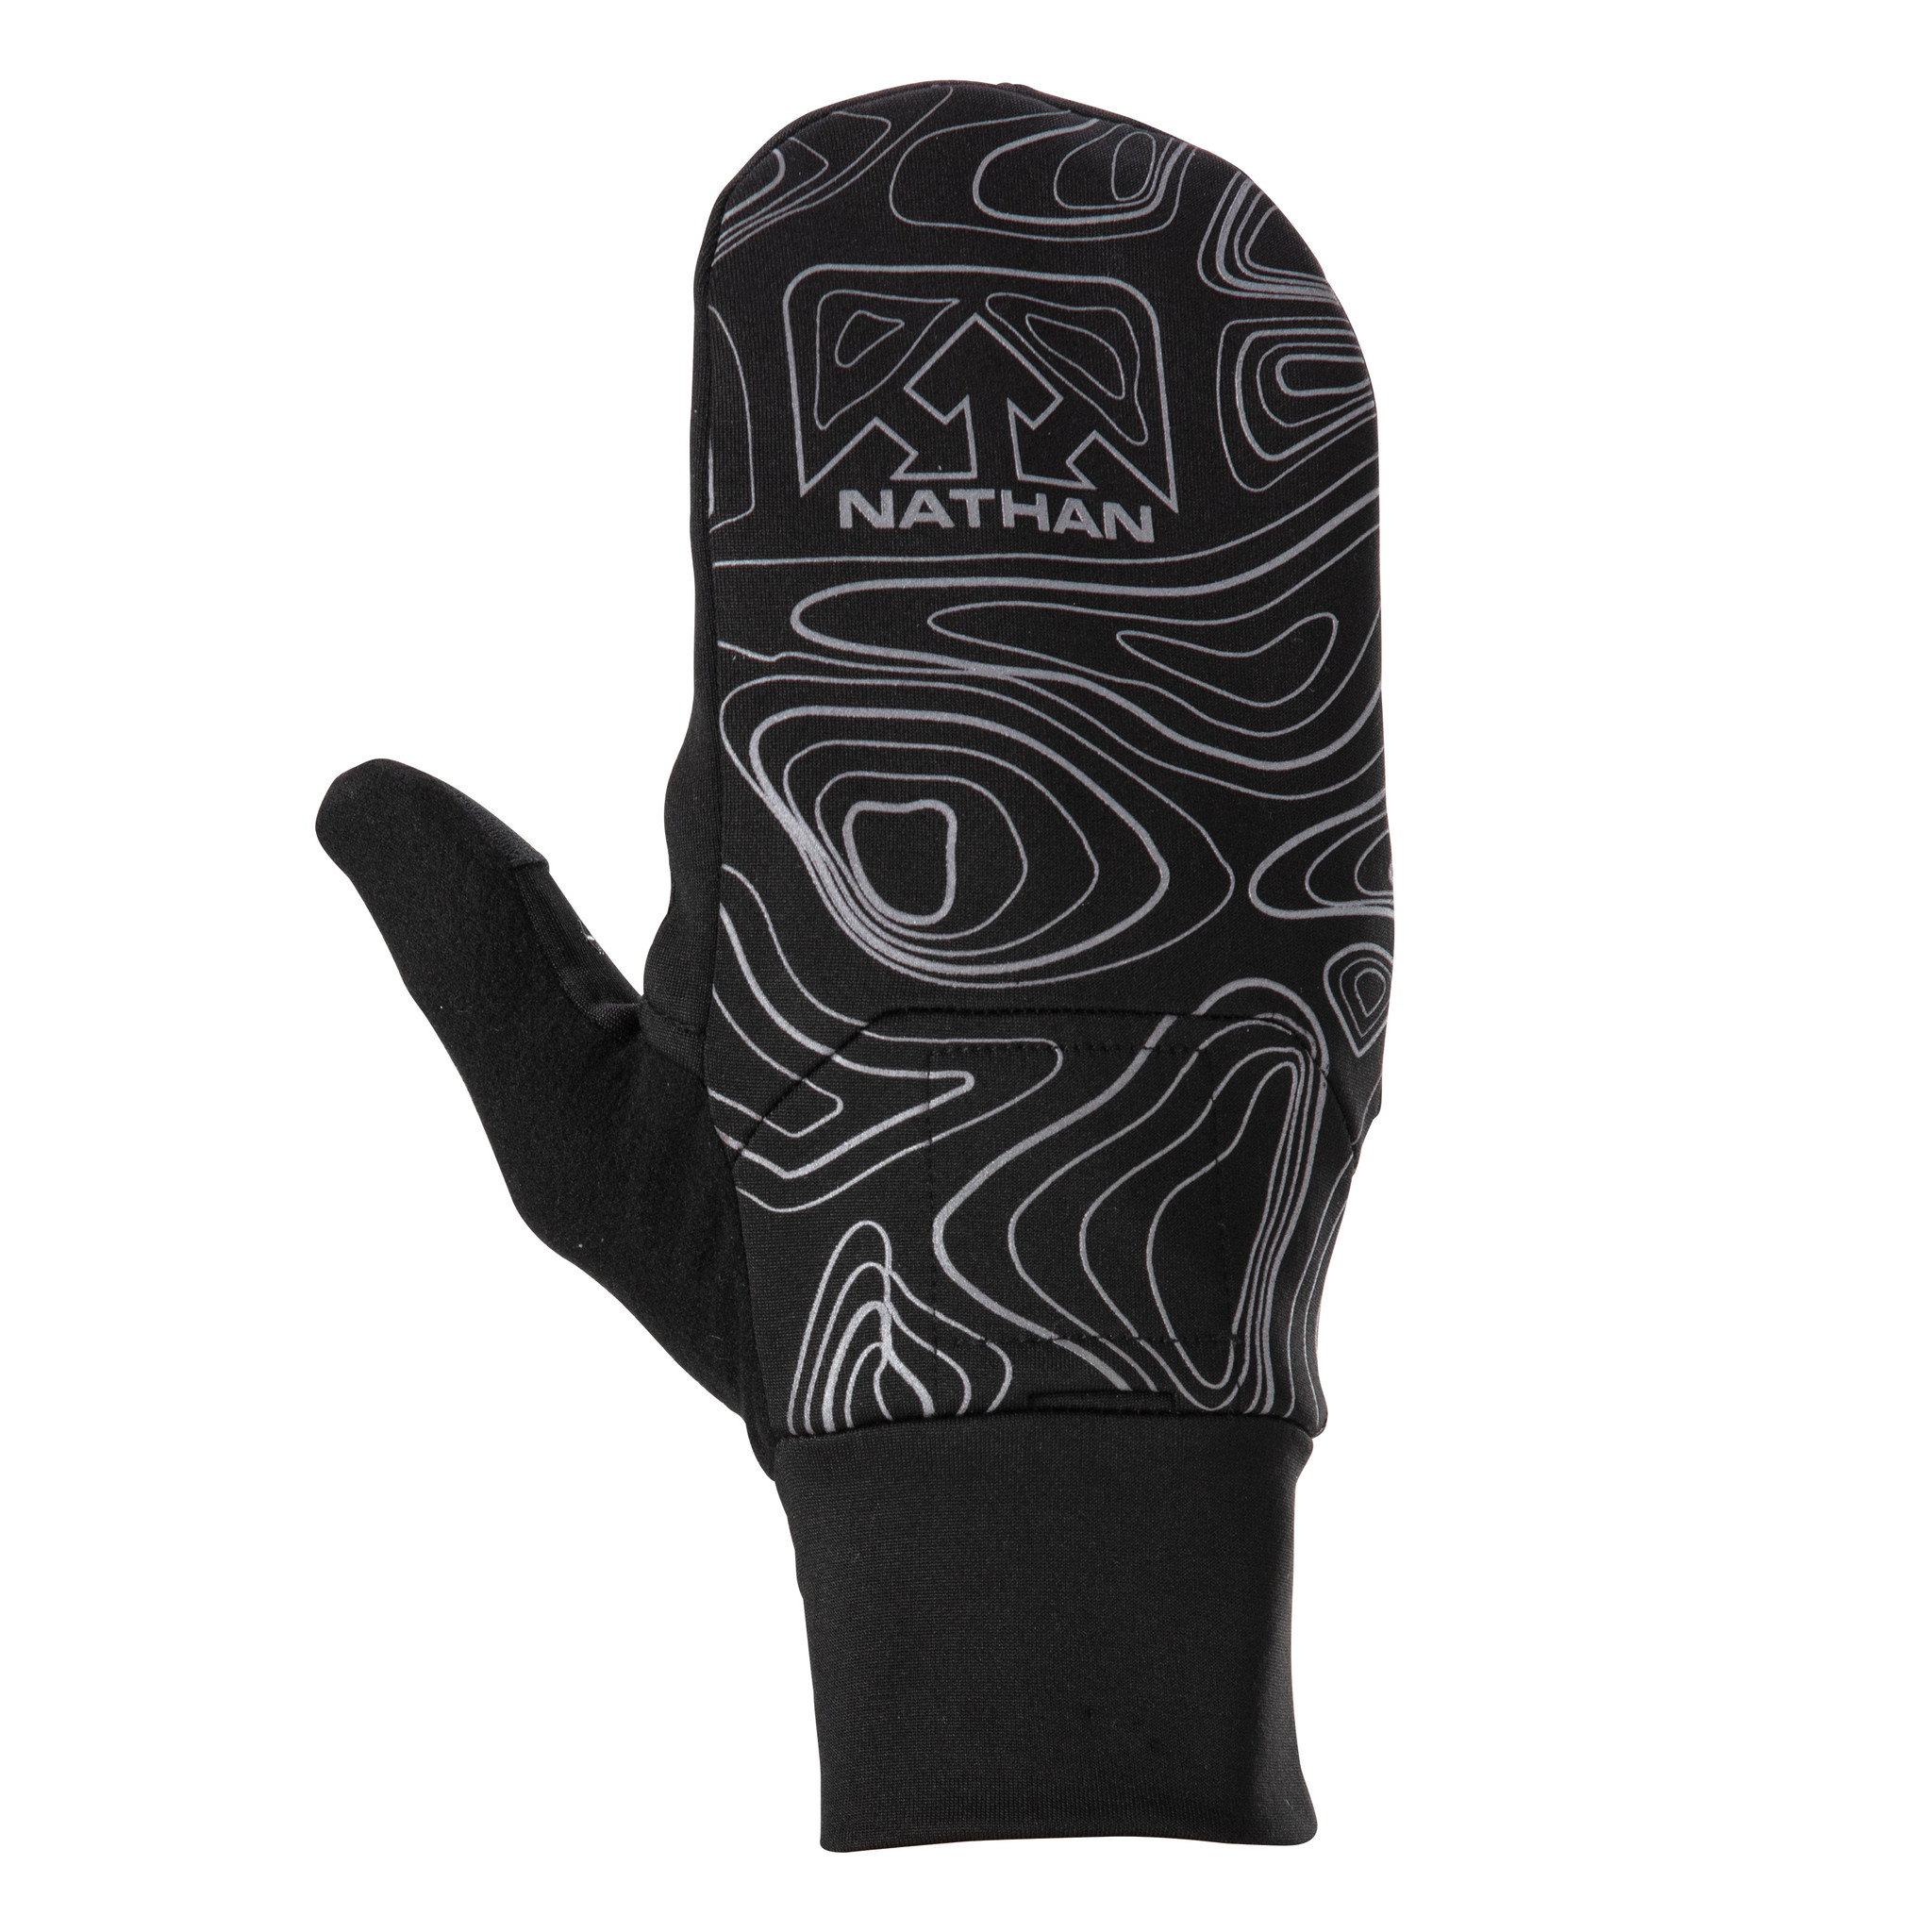 Nathan Nathan HyperNight Reflective Convertible Glove/Mitt